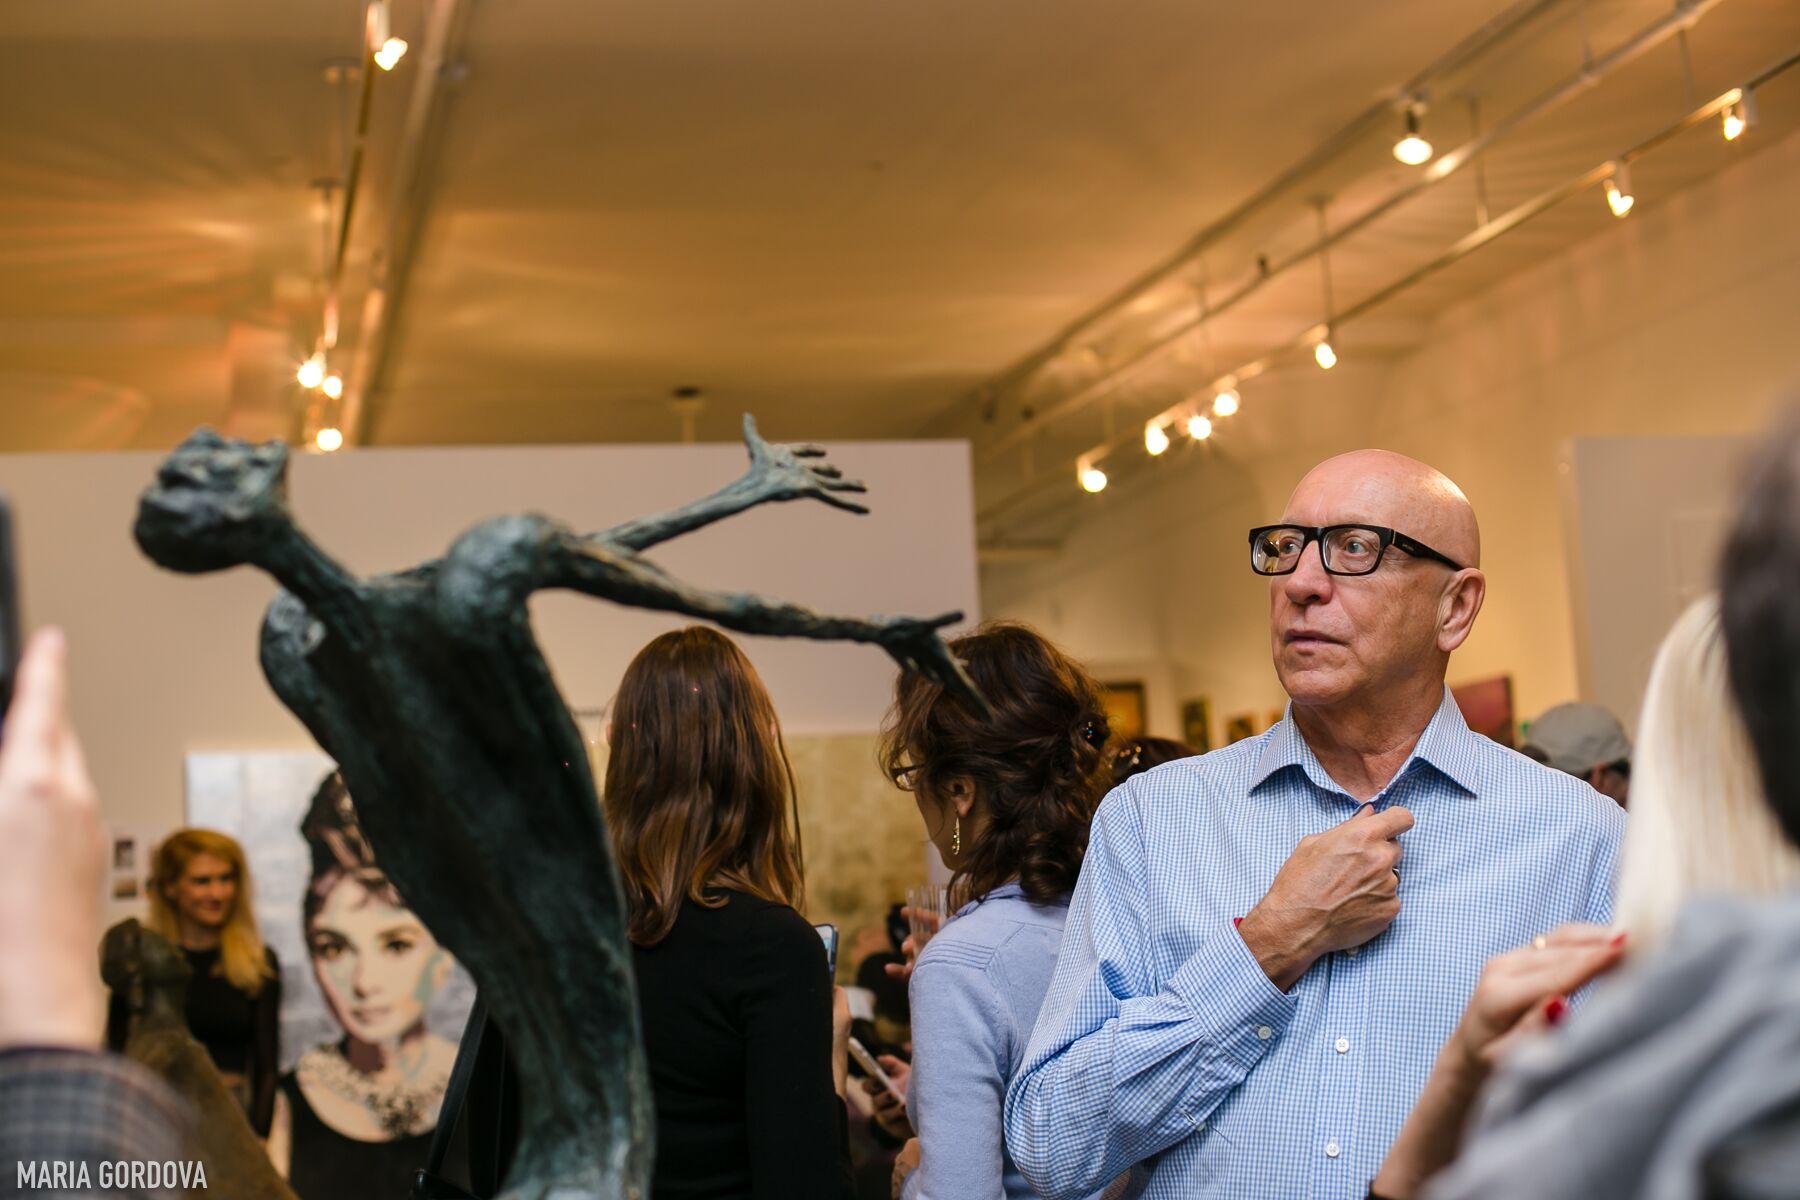 Скульптура Эмиля Зильбермана впечатляет зрителей